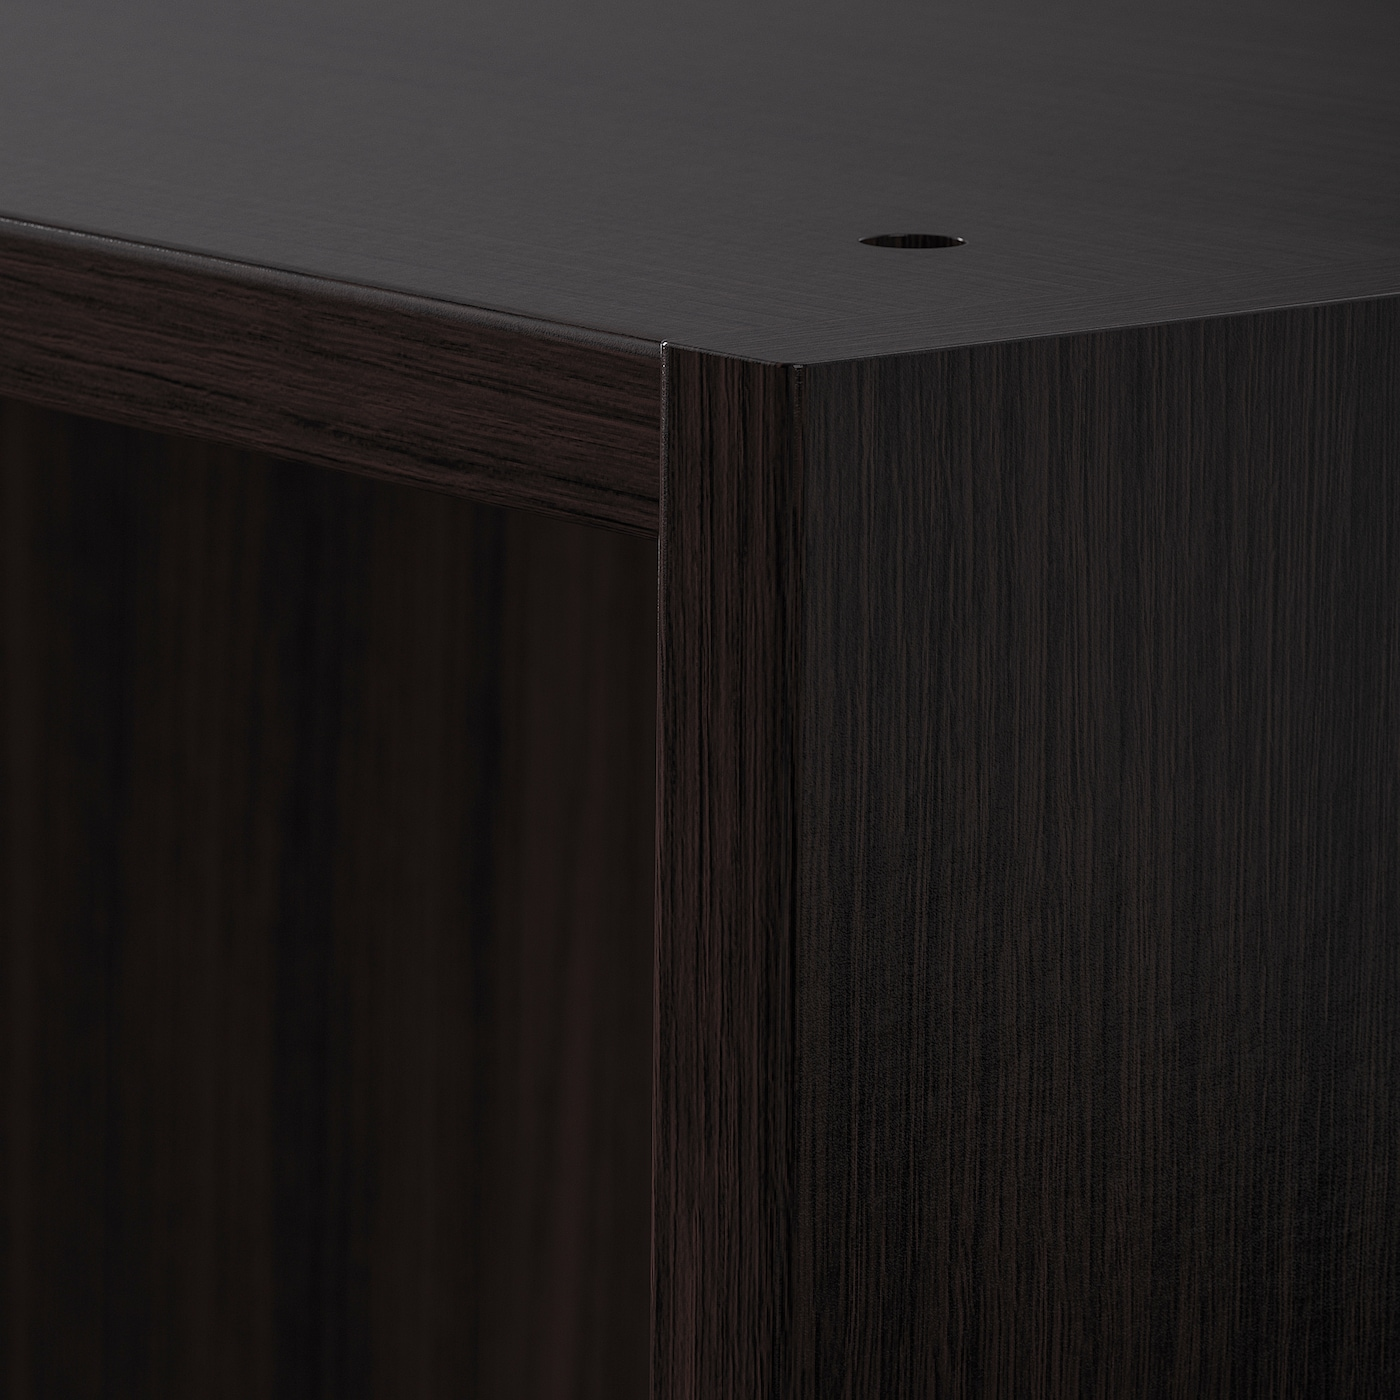 PAX Korpus ormara, crno-smeđa, 75x35x236 cm